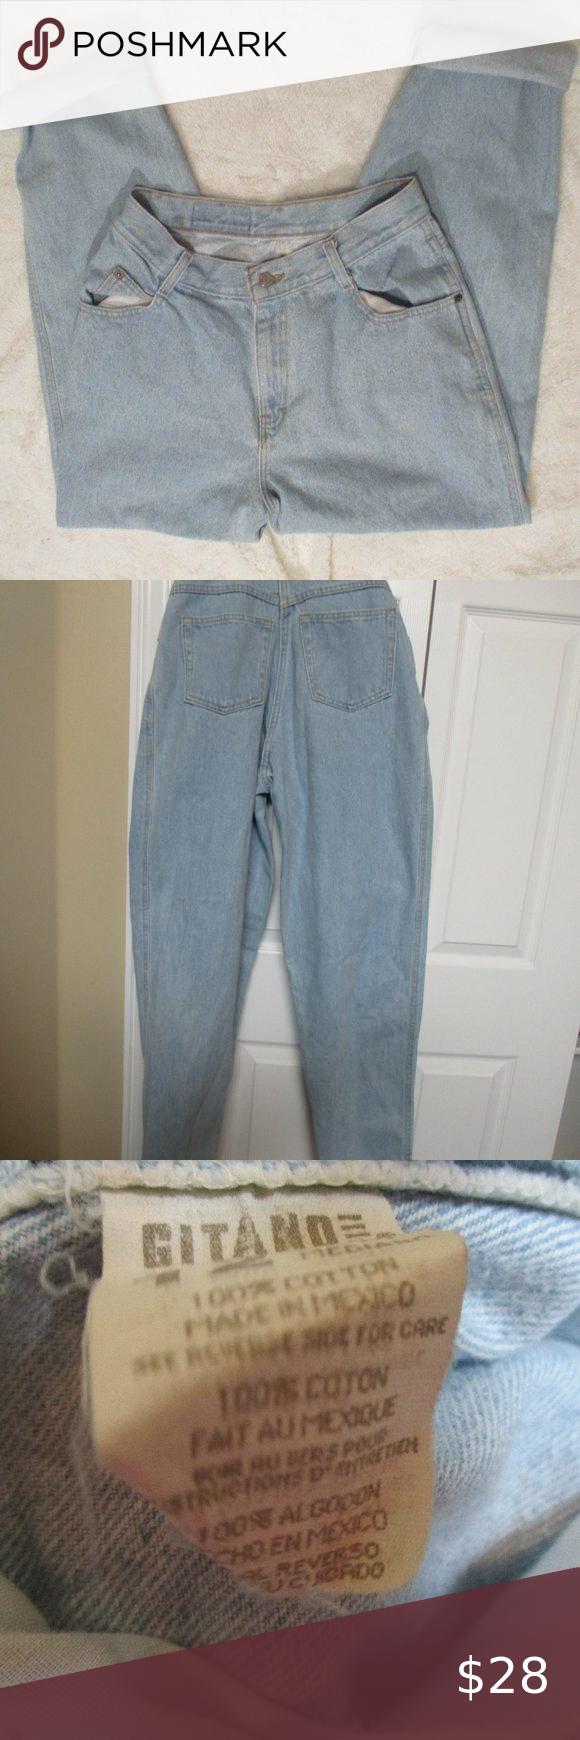 Gitano High Waist Taper Mom Jeans Light Wash